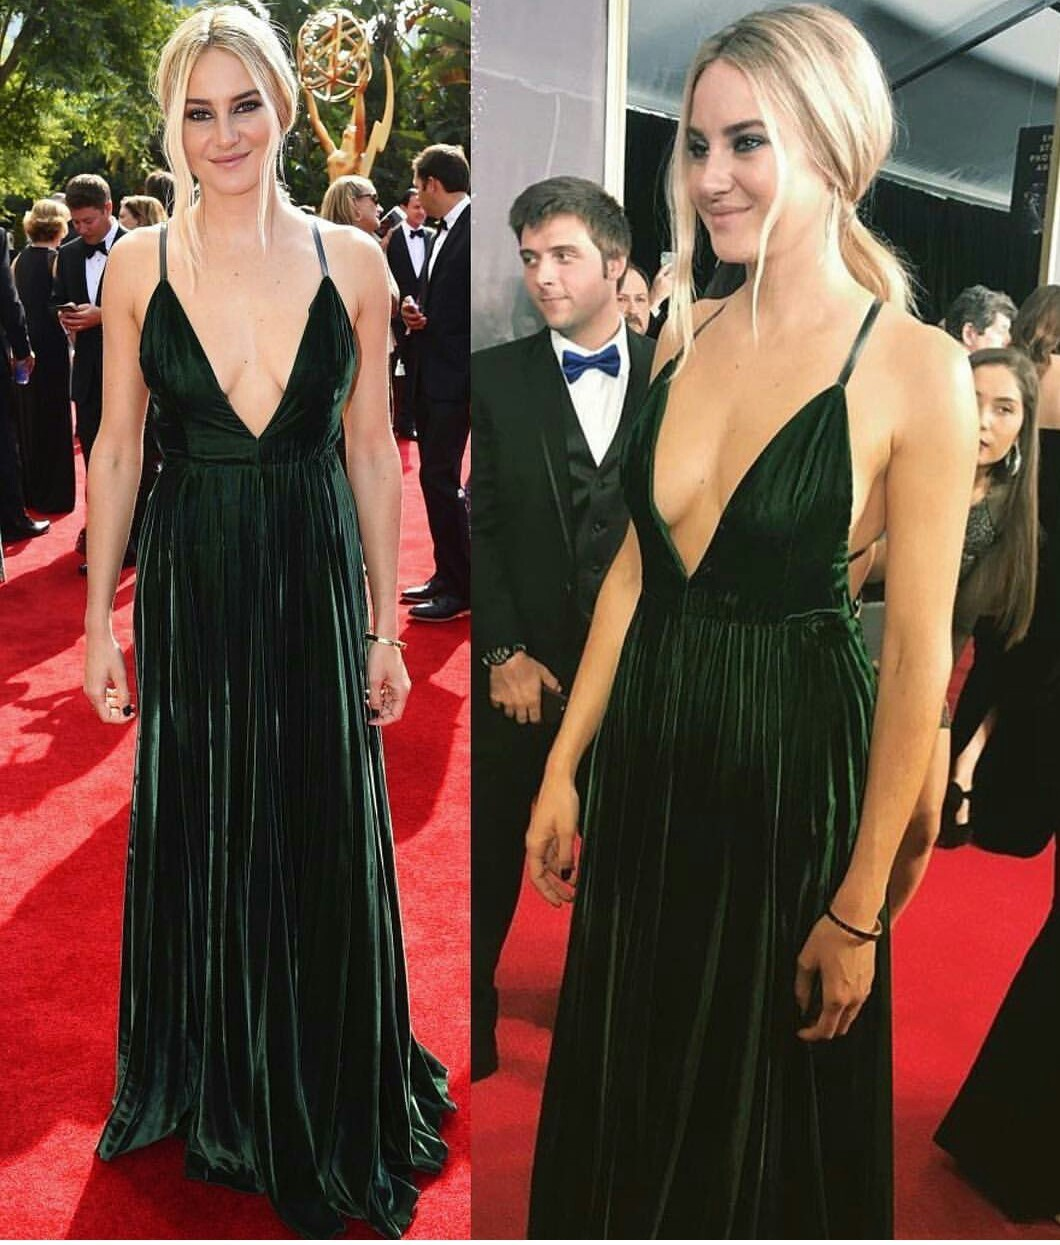 muoti tyylejä erotuskengät katsella Shailene Woodley en la Red Carpet on We Heart It